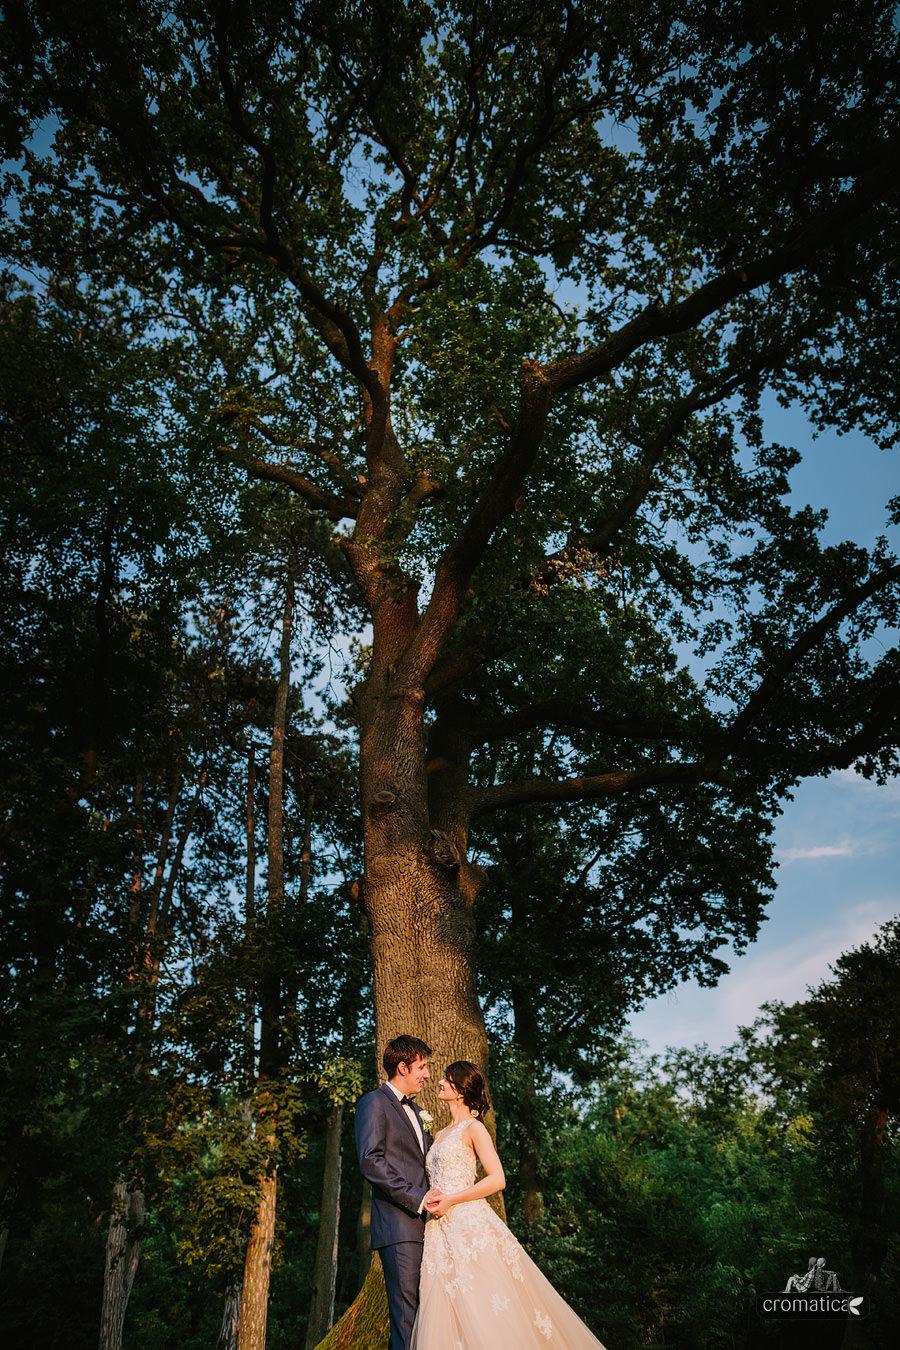 Mihaela & Chris - fotografii nunta Palatul Mogosoaia (29)